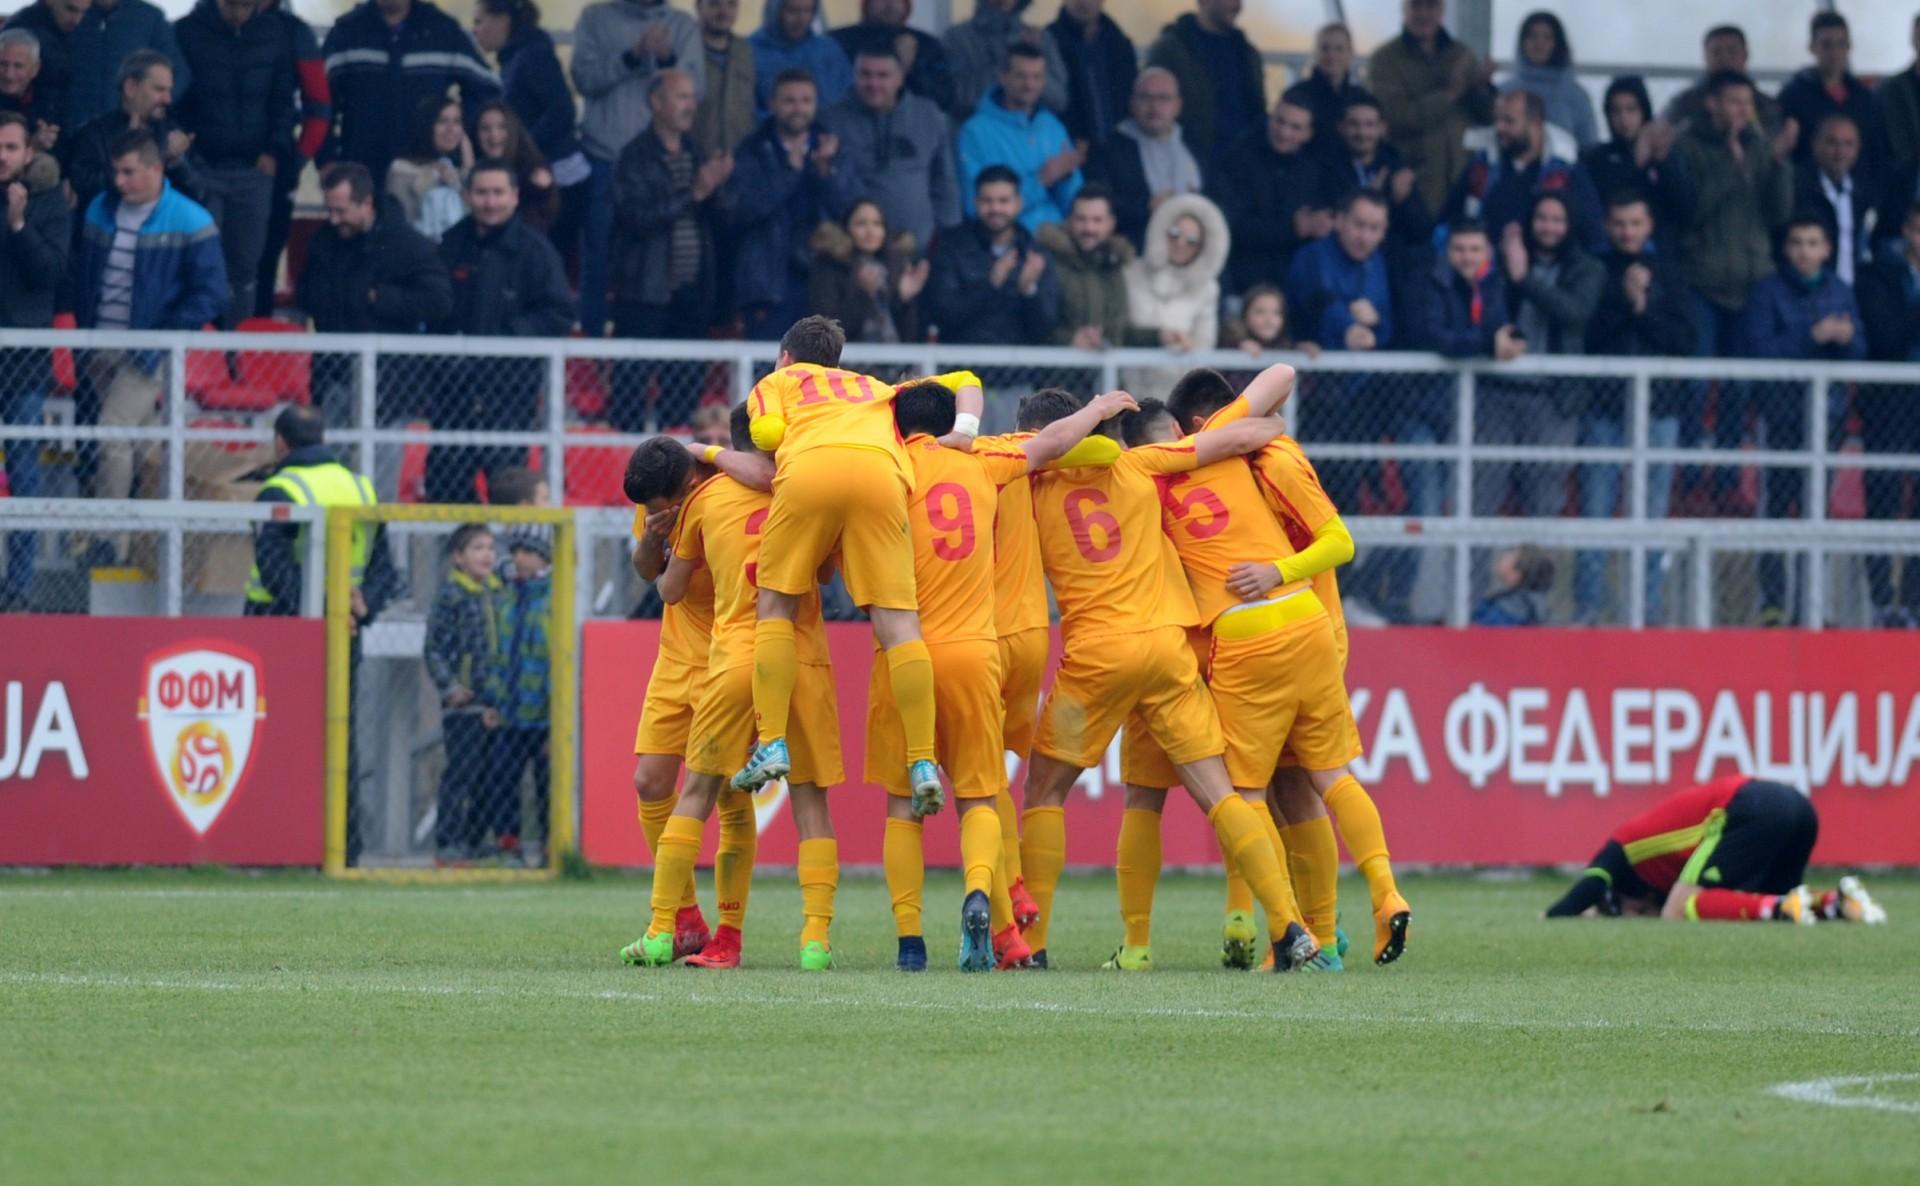 Скопје домаќин на квалификациите за ЕП за играчи до 19 години